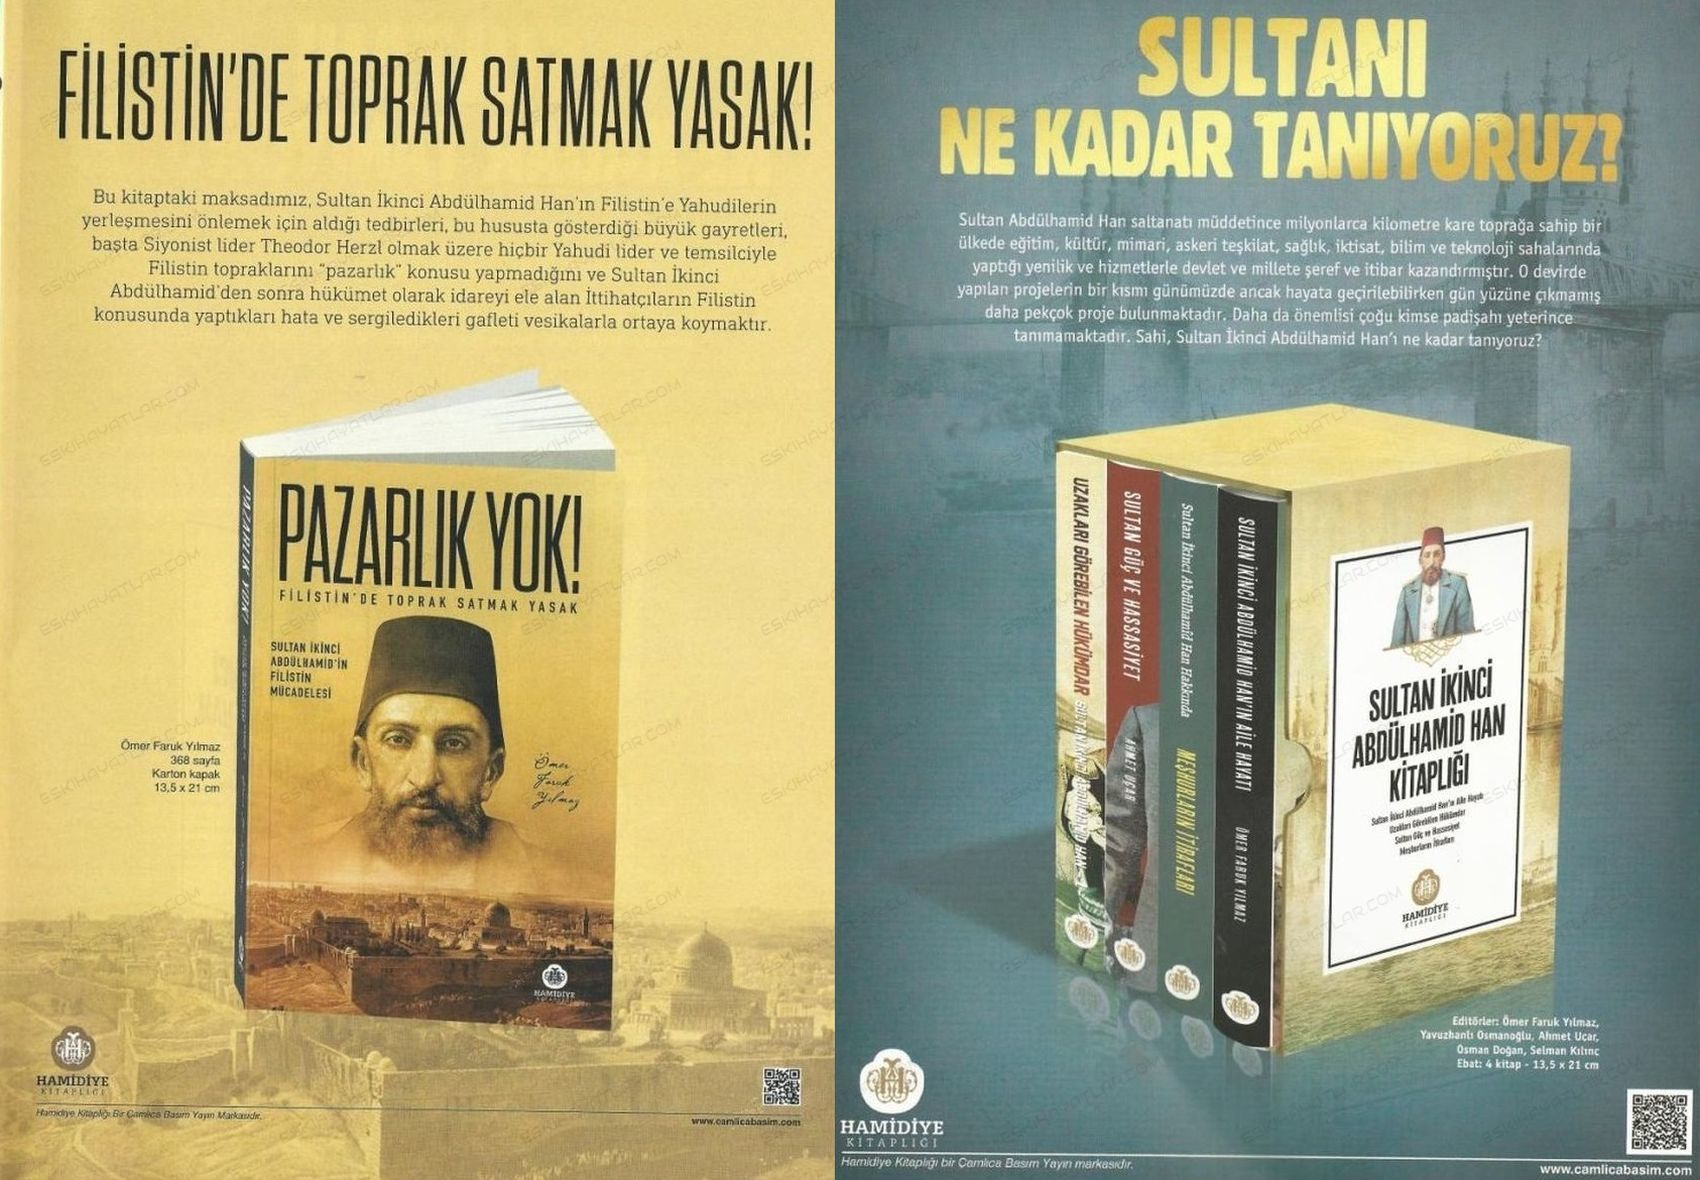 0369-sultan-abdulhamid-vefatinin-100-yili-yedi-kita-dergisi-abdulhamid-belgeseli (4)